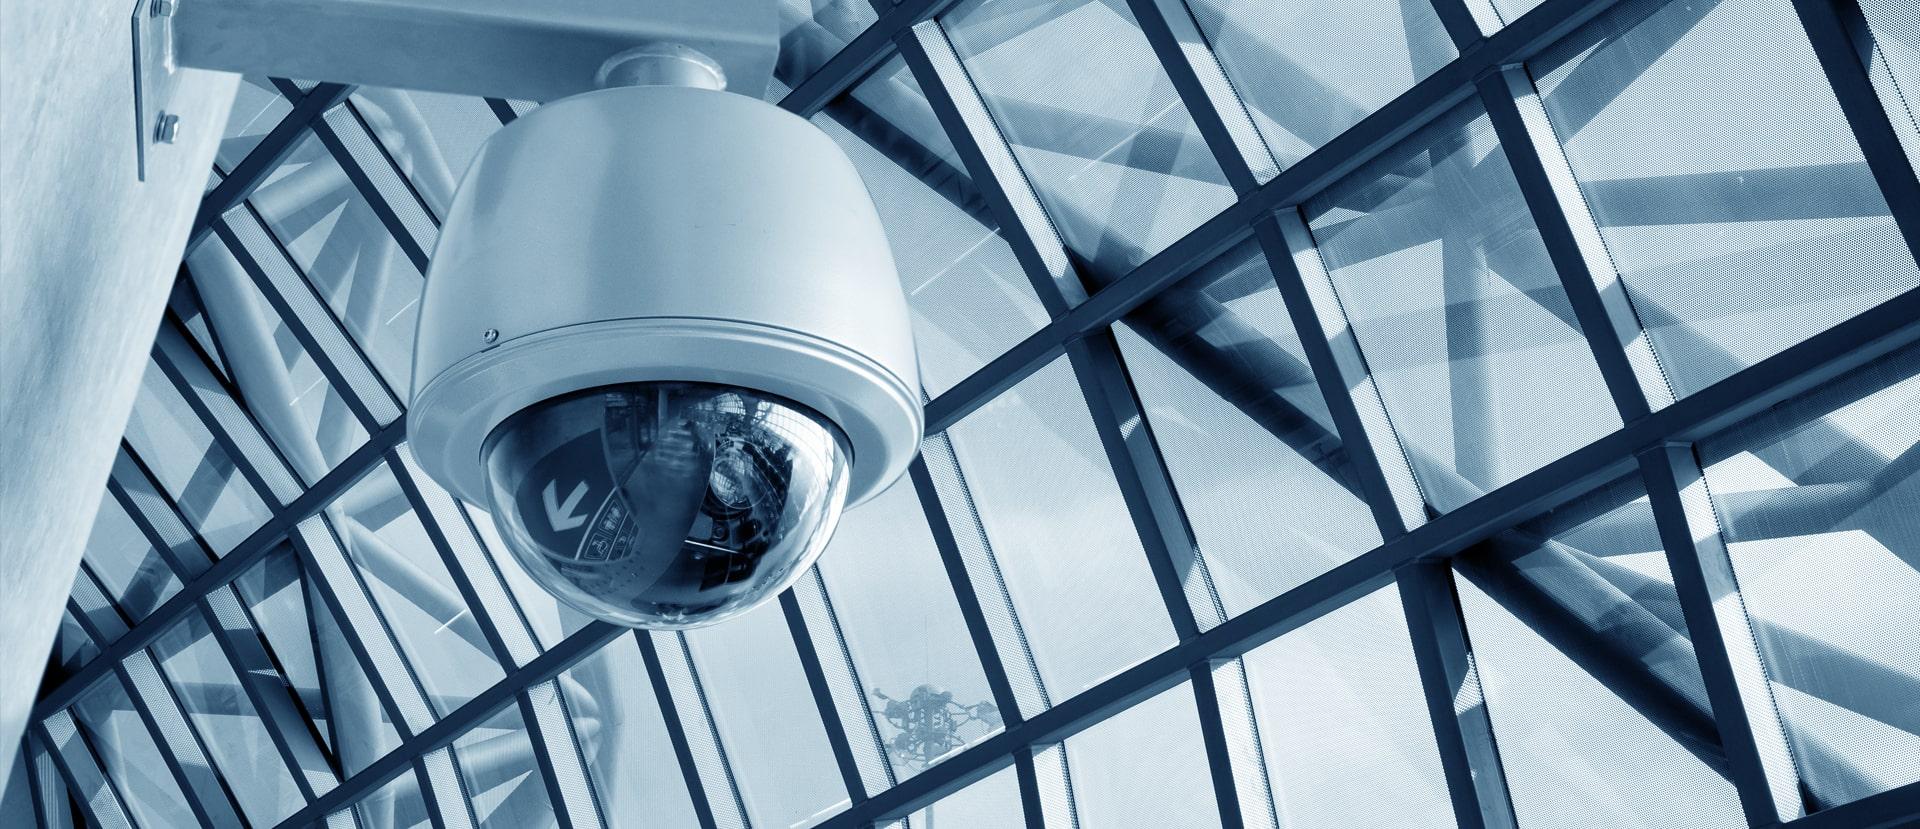 Business CCTV Installation & Management